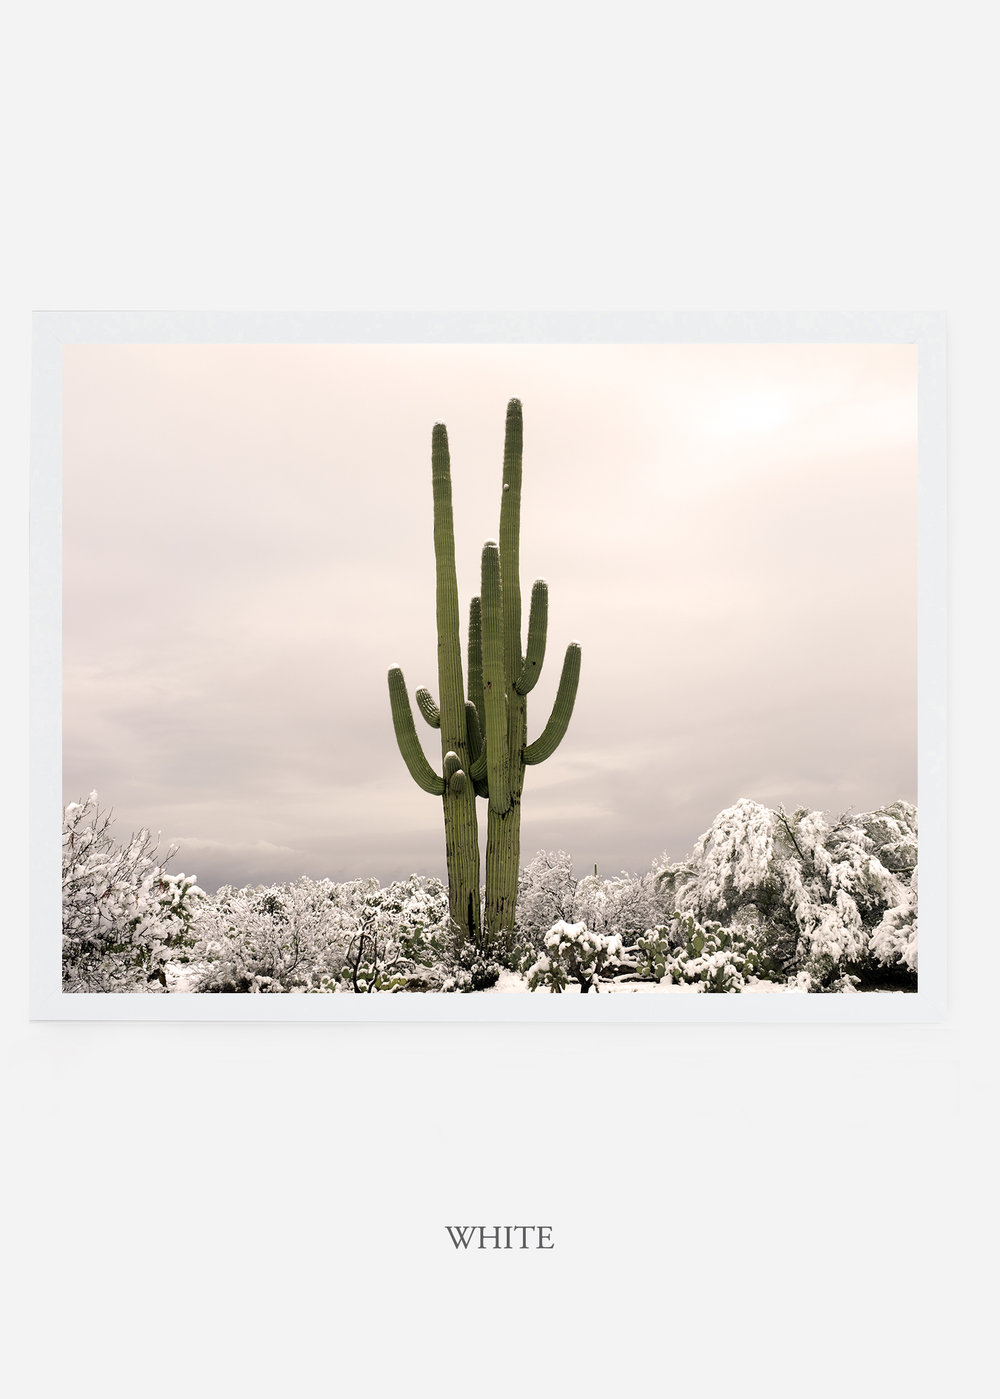 nomat_whiteframe-saguaroNo.5-wildercalifornia-art-wallart-cactusprint-homedecor-prints-arizona-botanical-artwork-interiordesign.jpg